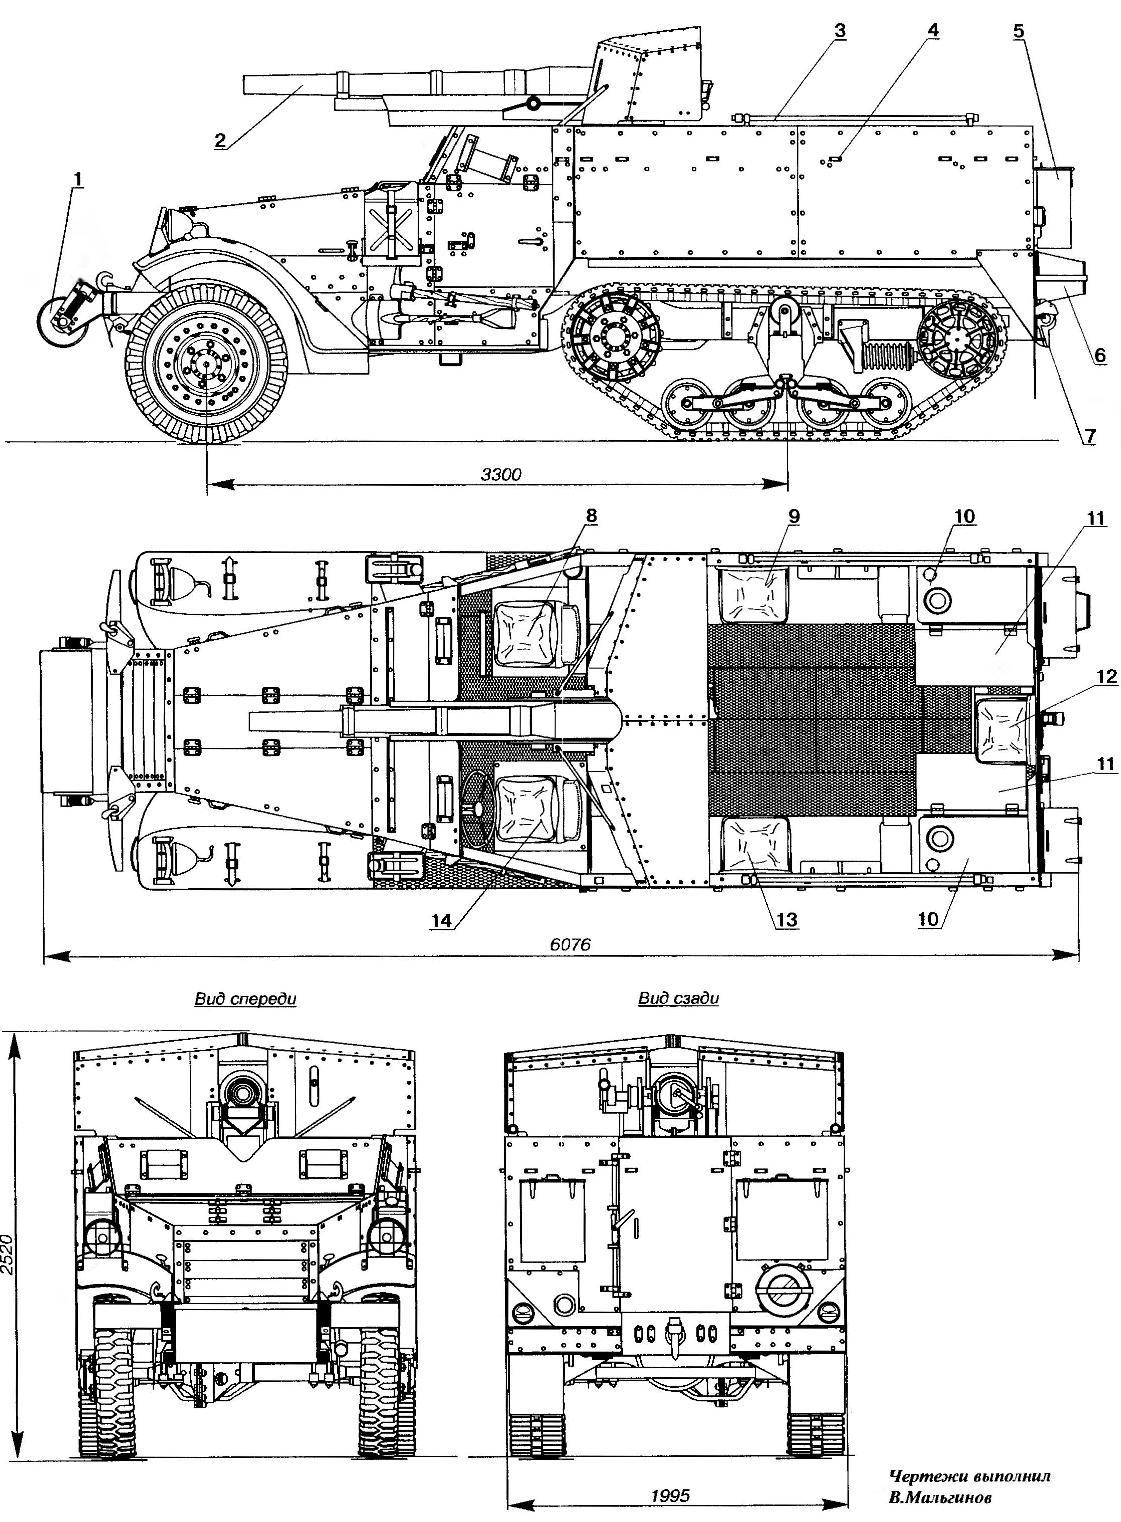 M3 75 mm GMC